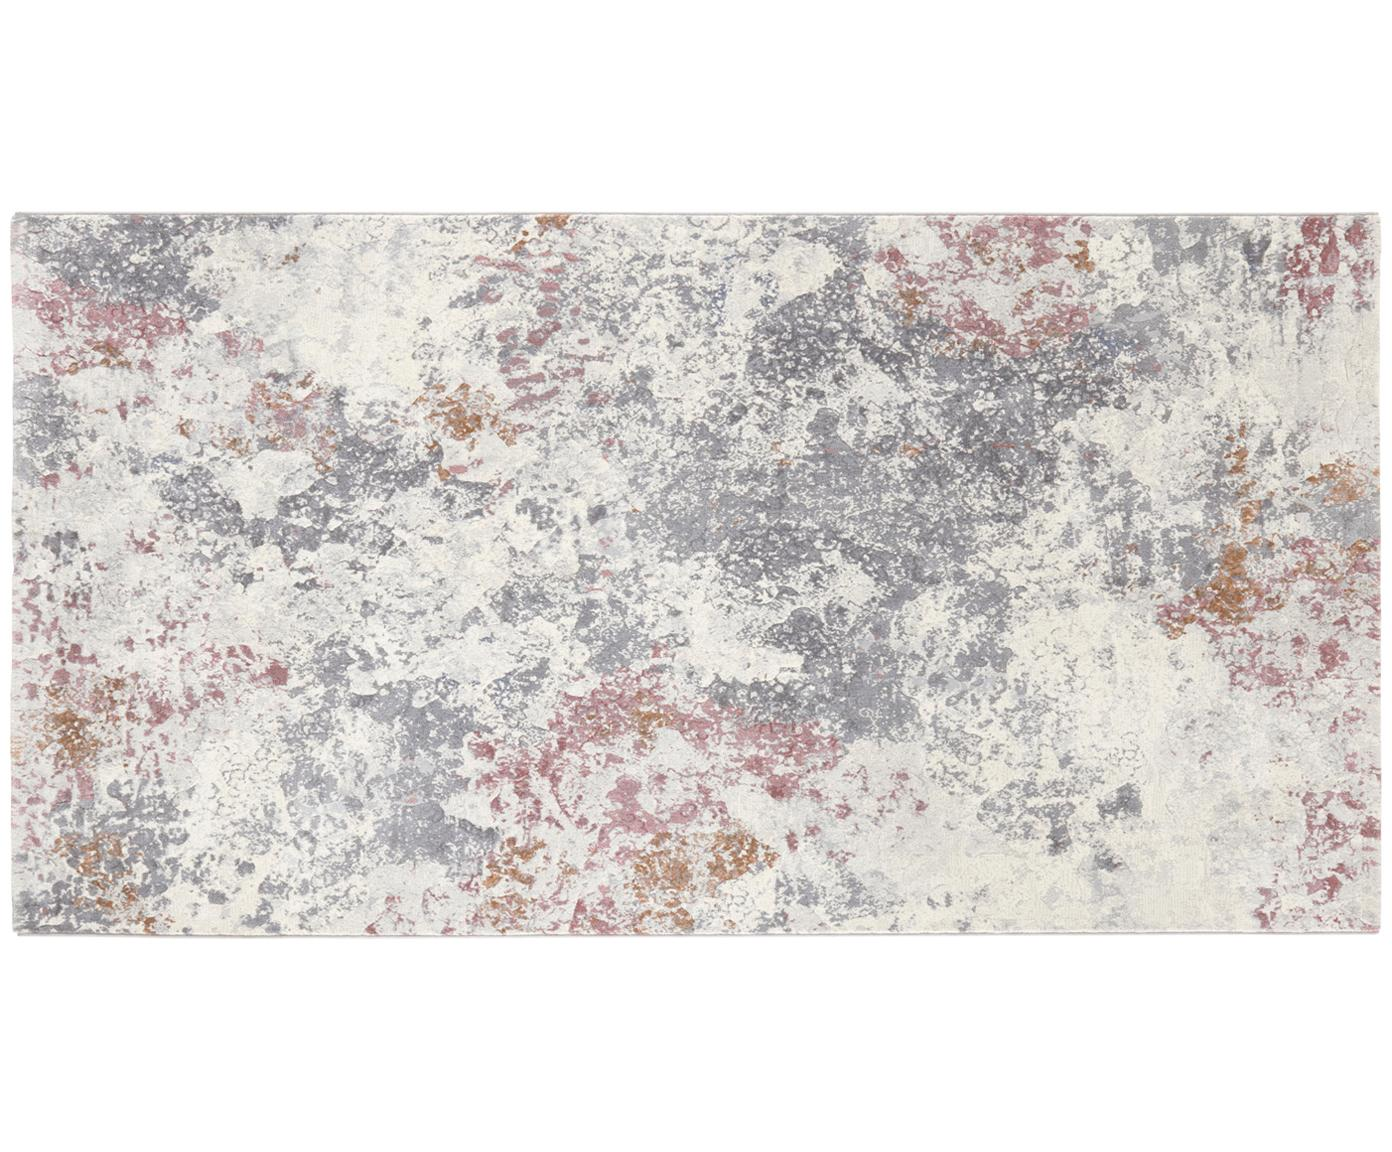 Alfombra de diseño Fontaine, Parte superior: polipropileno, Reverso: yute, Crema, gris, rojo frambuesa, An 80 x L 150 cm (Tamaño XS)